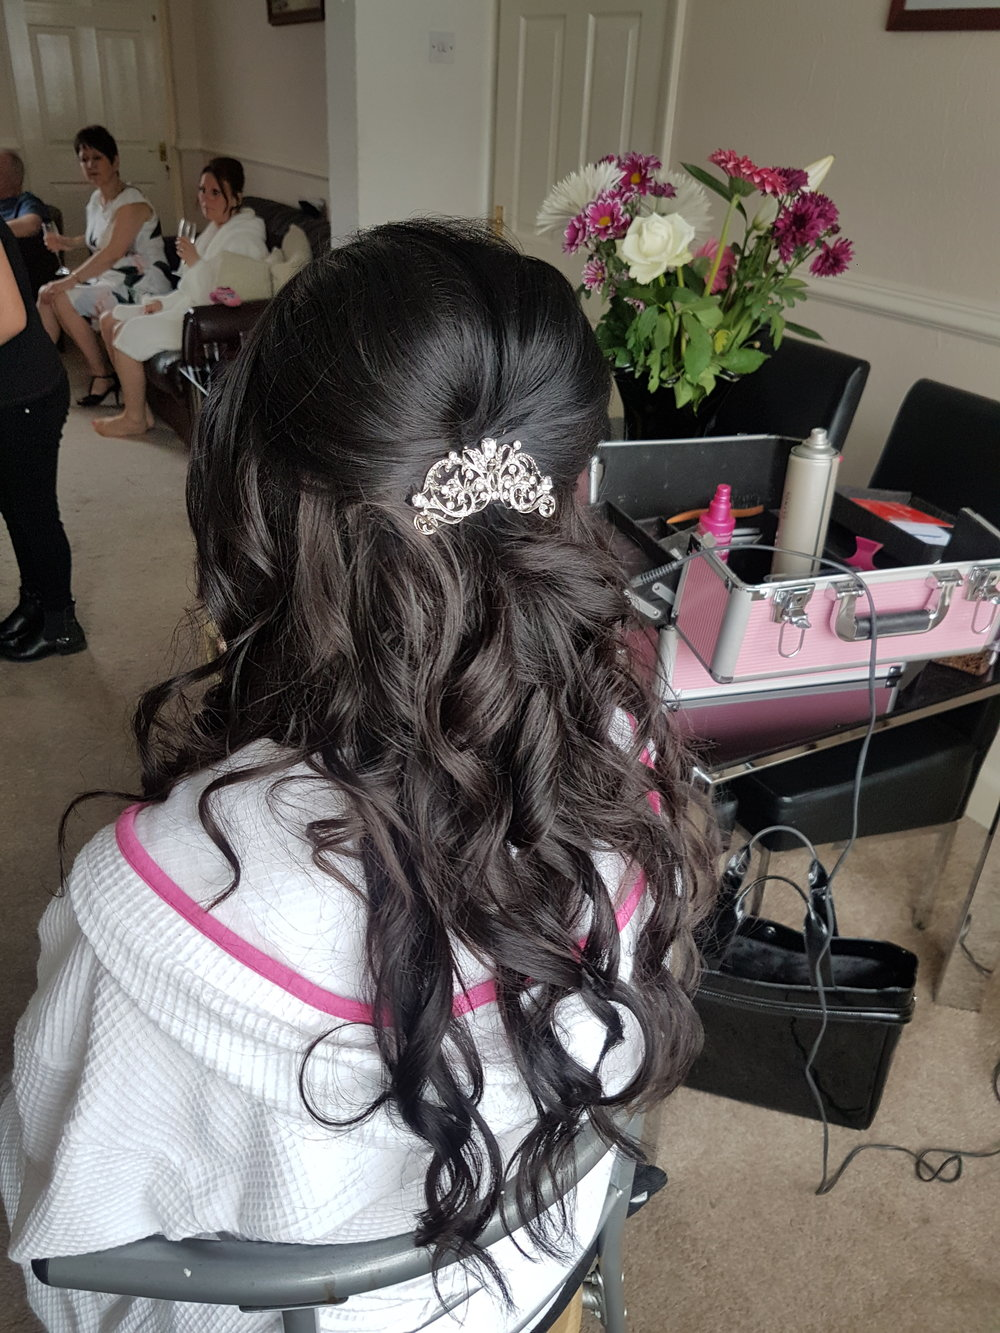 Bridal Hairstyle - Half Up Half Down